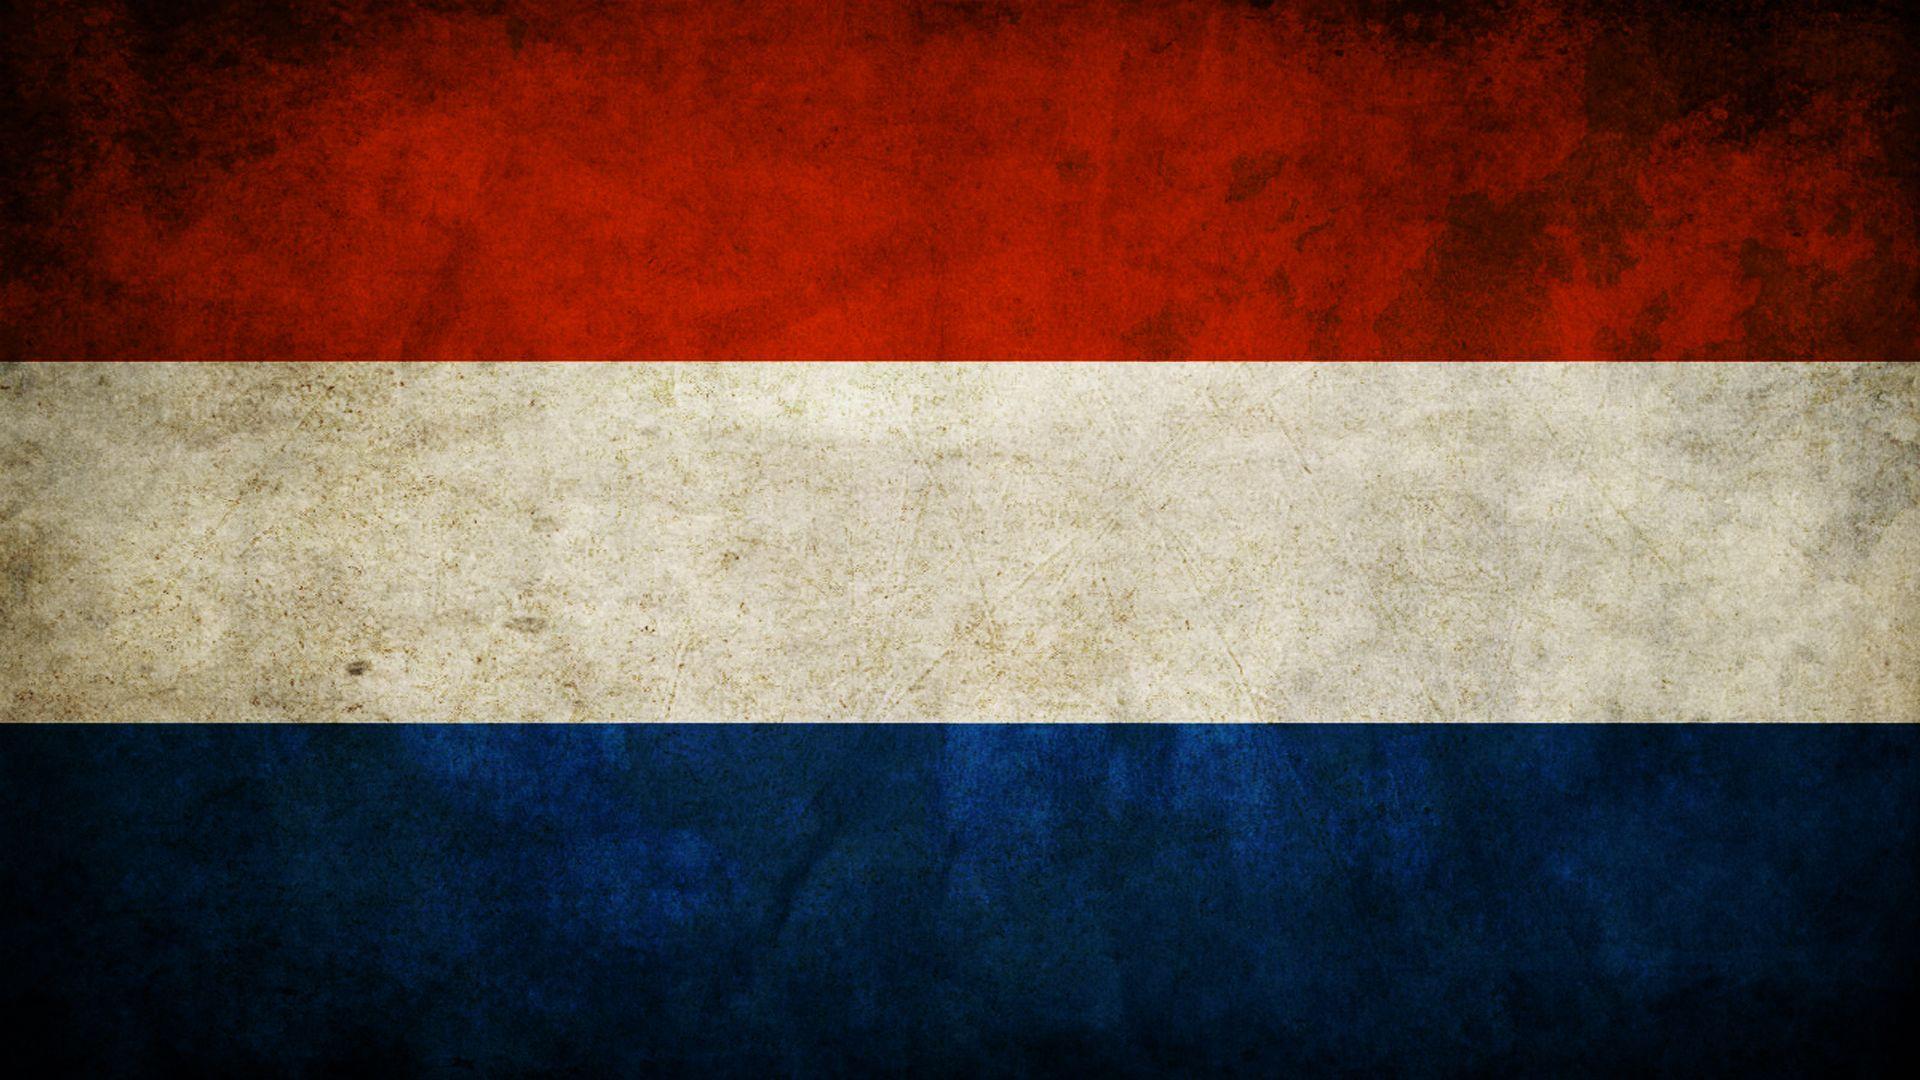 Dutch Flag Hd Wallpaper Fullhdwpp Full Hd Wallpapers 1920x1080 Belanda Gambar Dinding Gambar